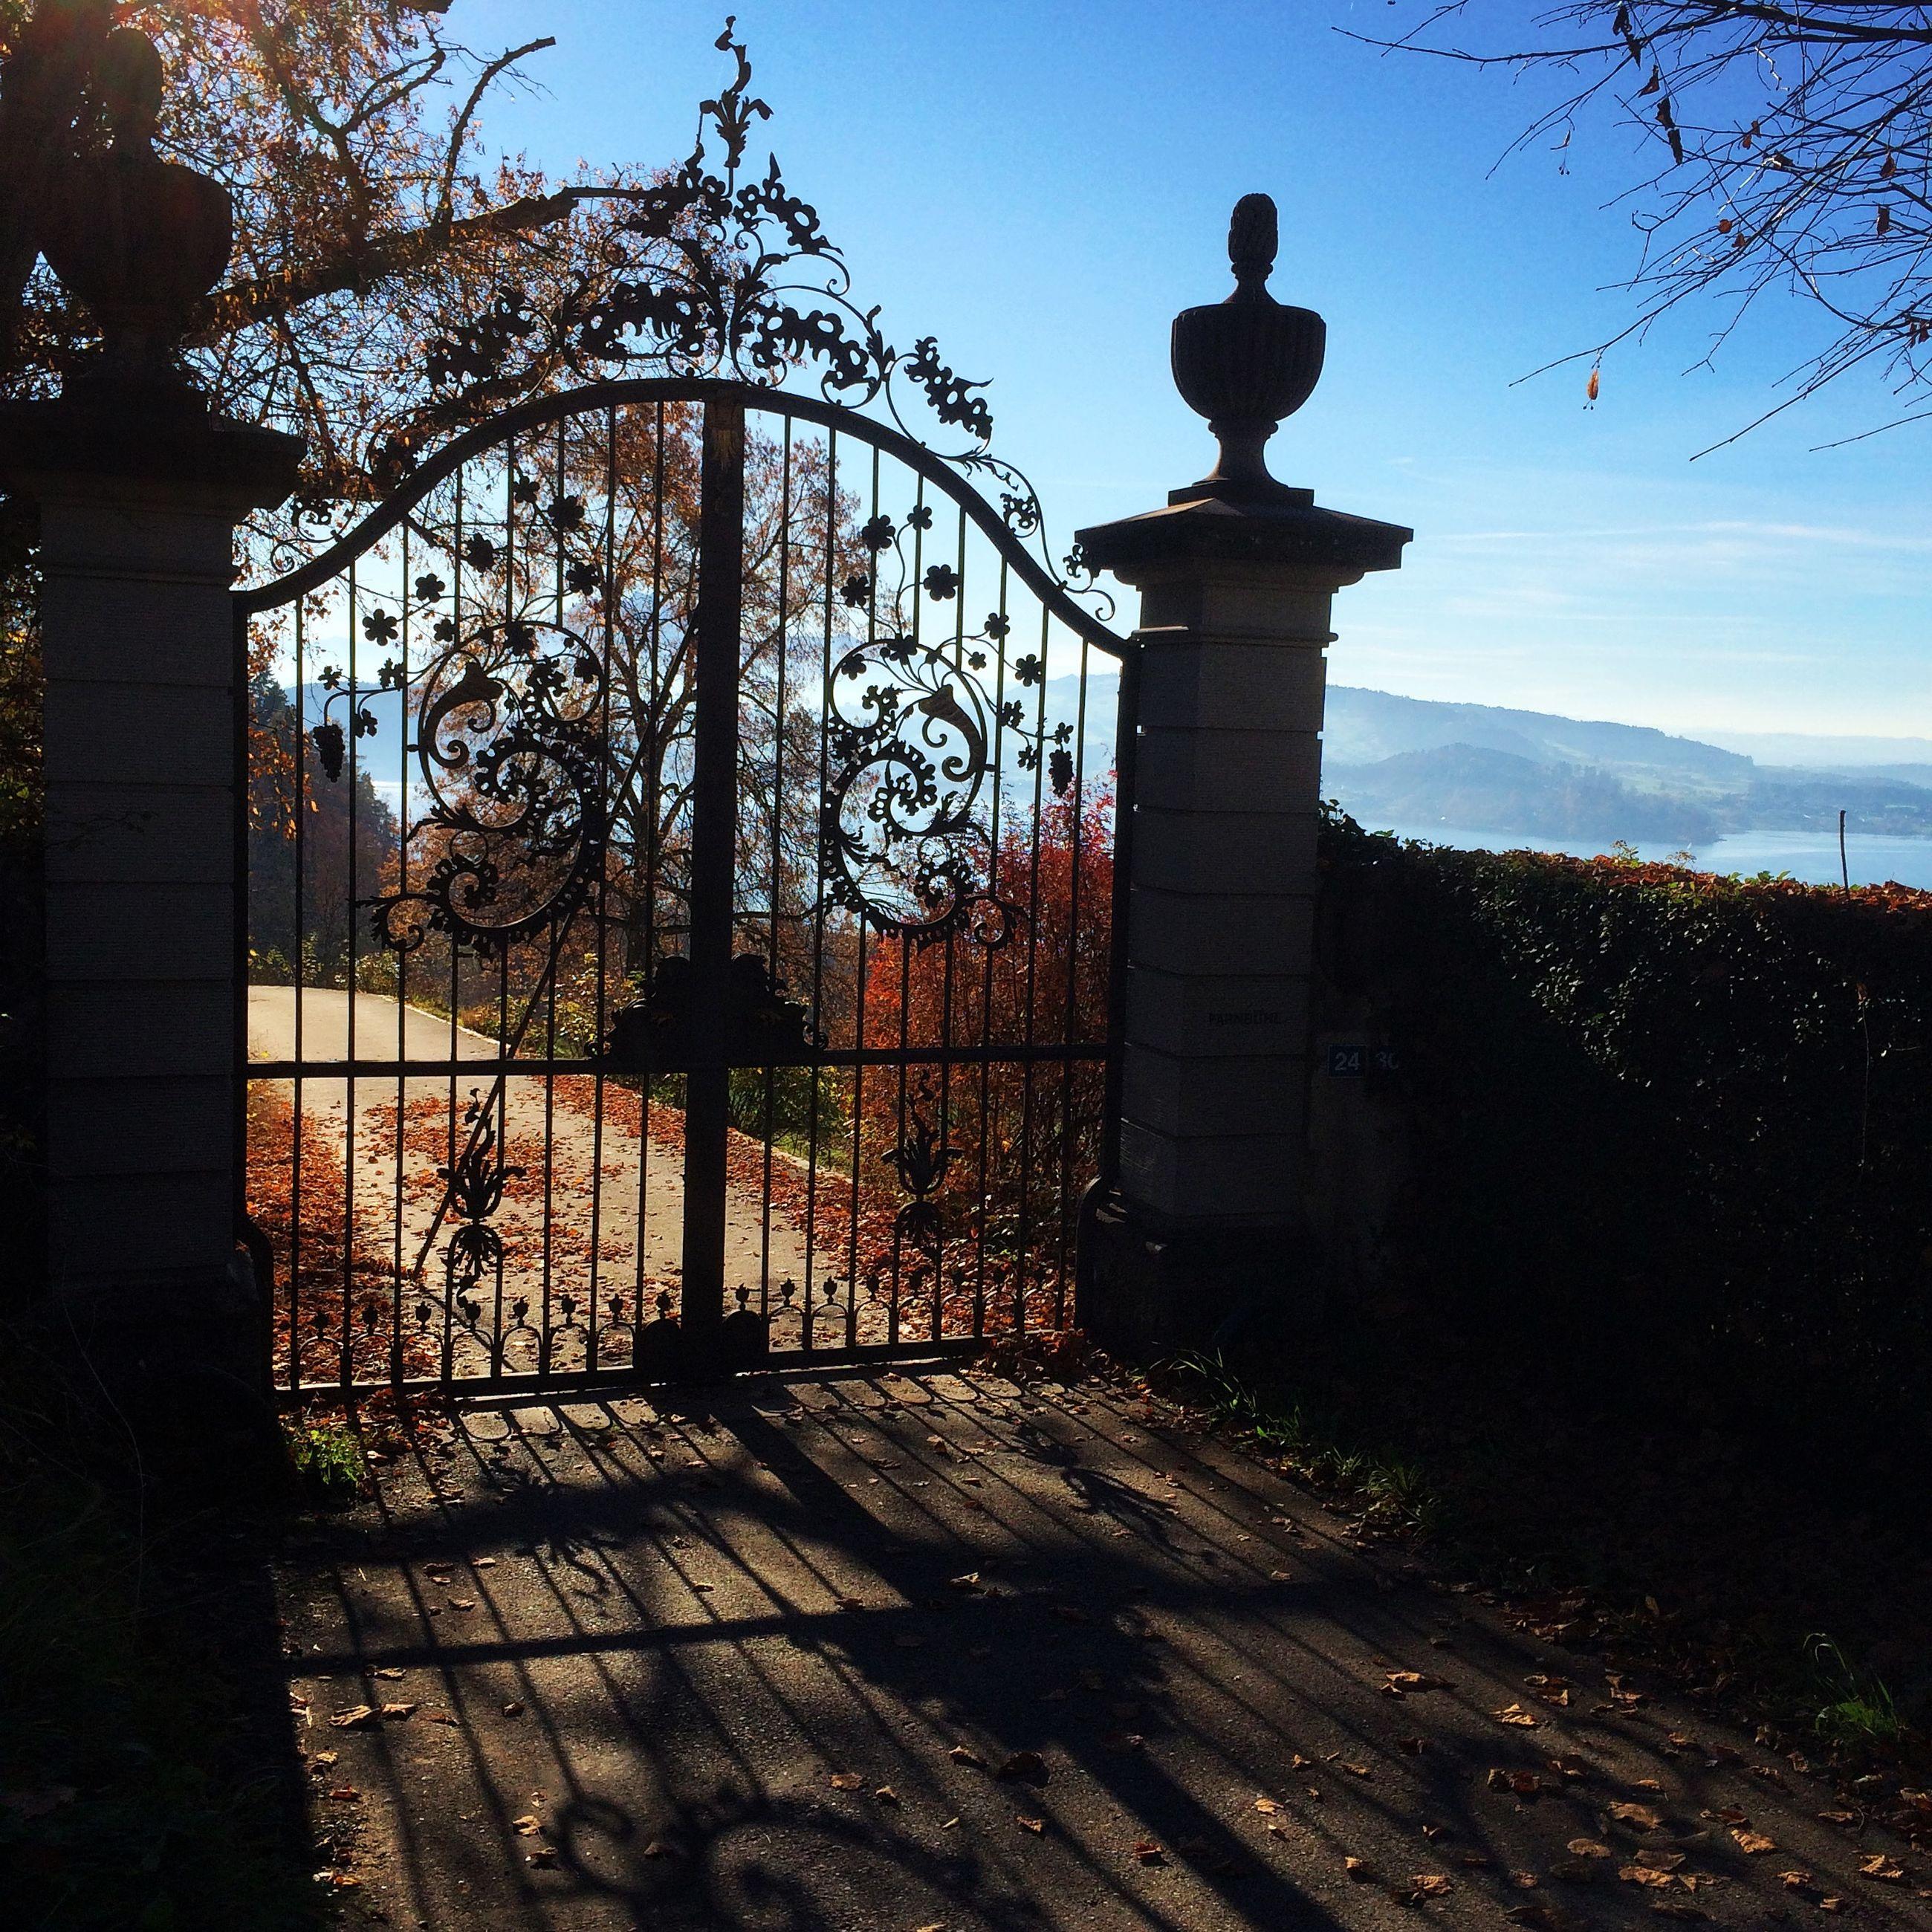 Closed gate against blue sky